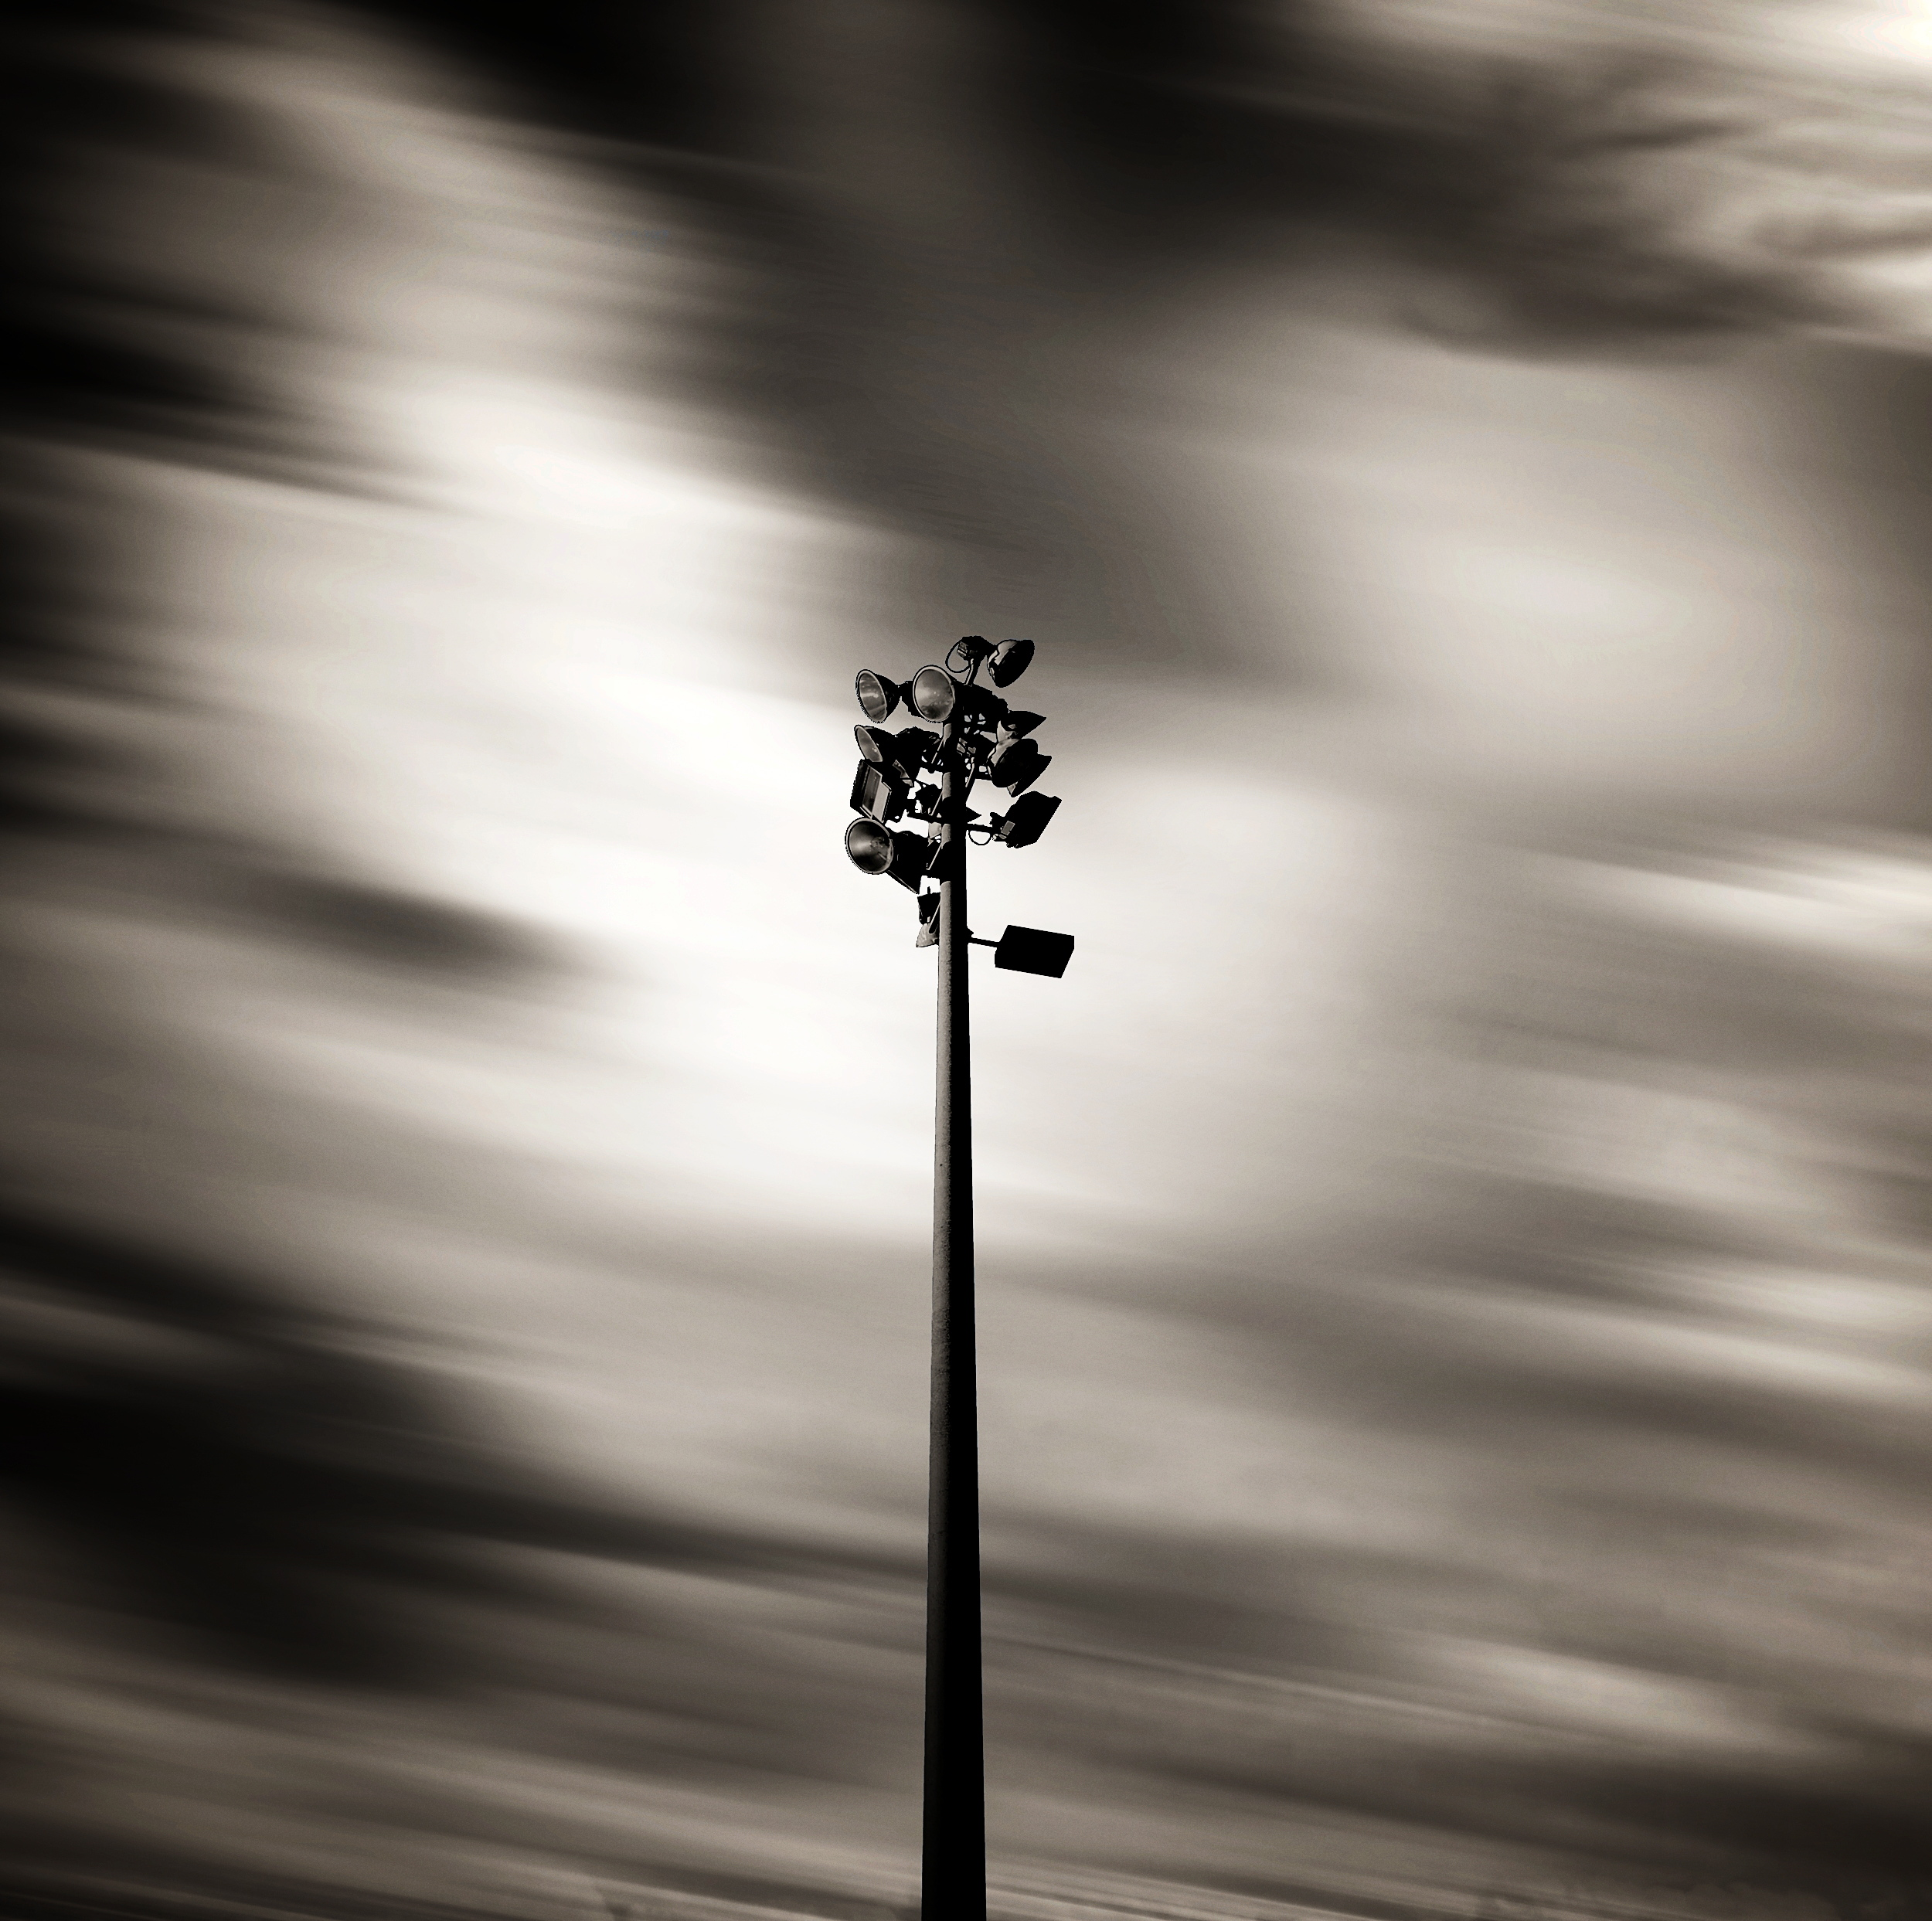 lightpole lomo.jpg